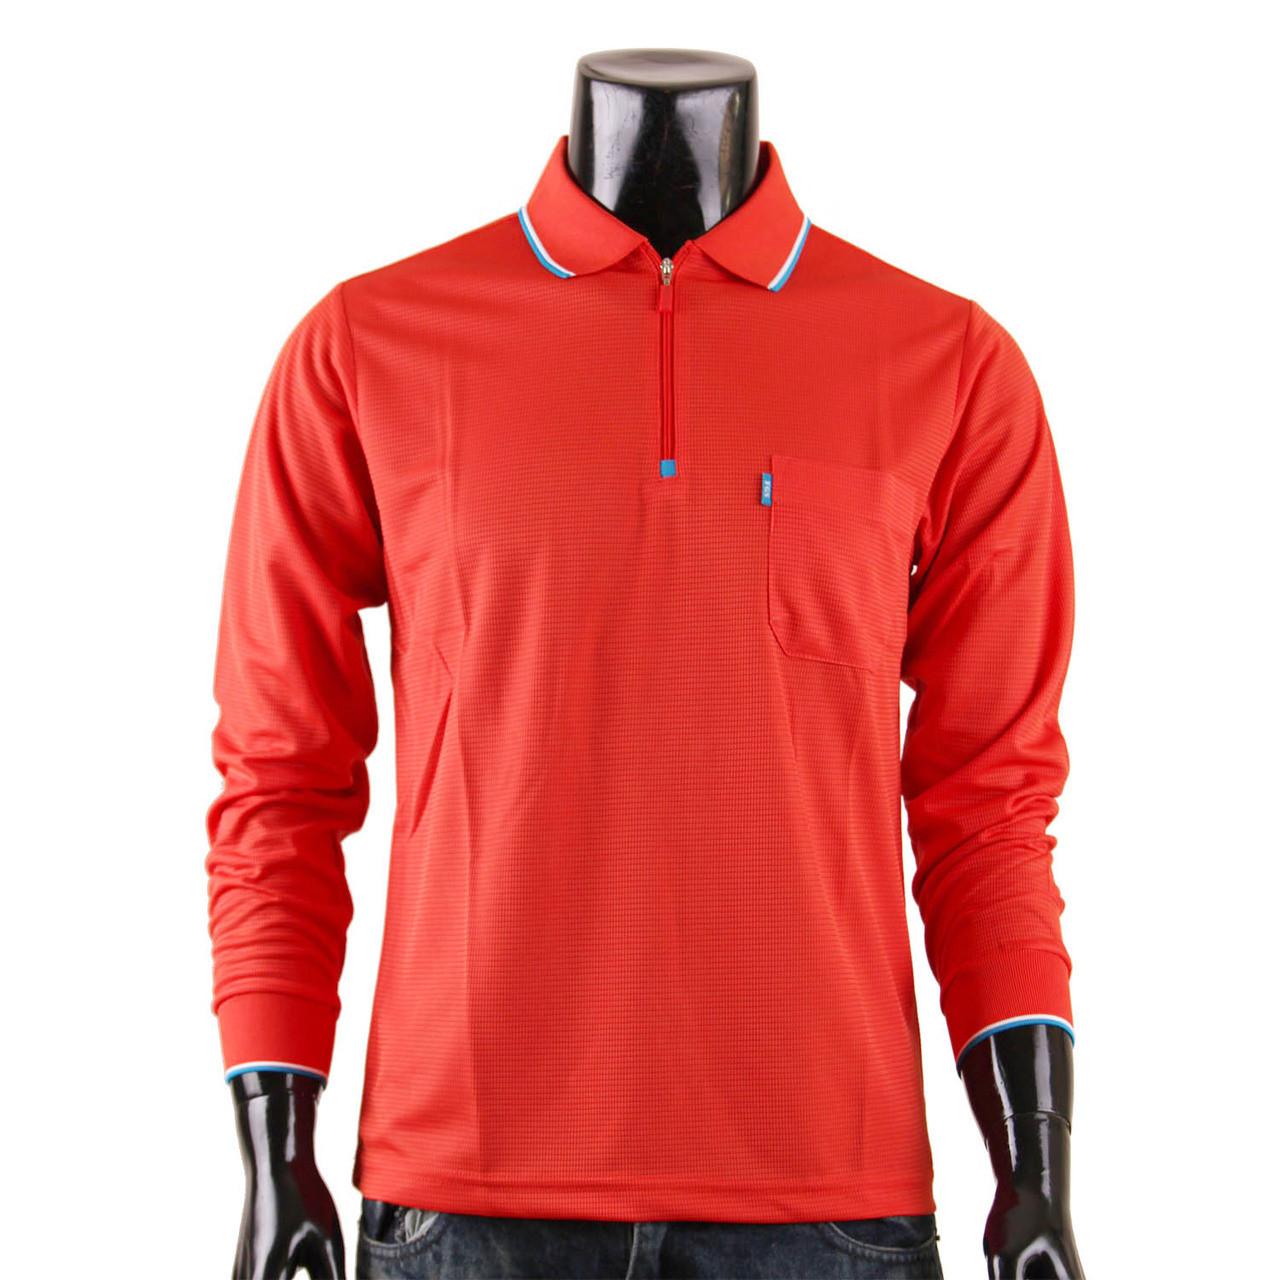 2425a9b7 Men's Zip Polo Shirt Plain Zip Polo Shirt Long Sleeves DRI FIT Scarlet Zip  Polo shirt